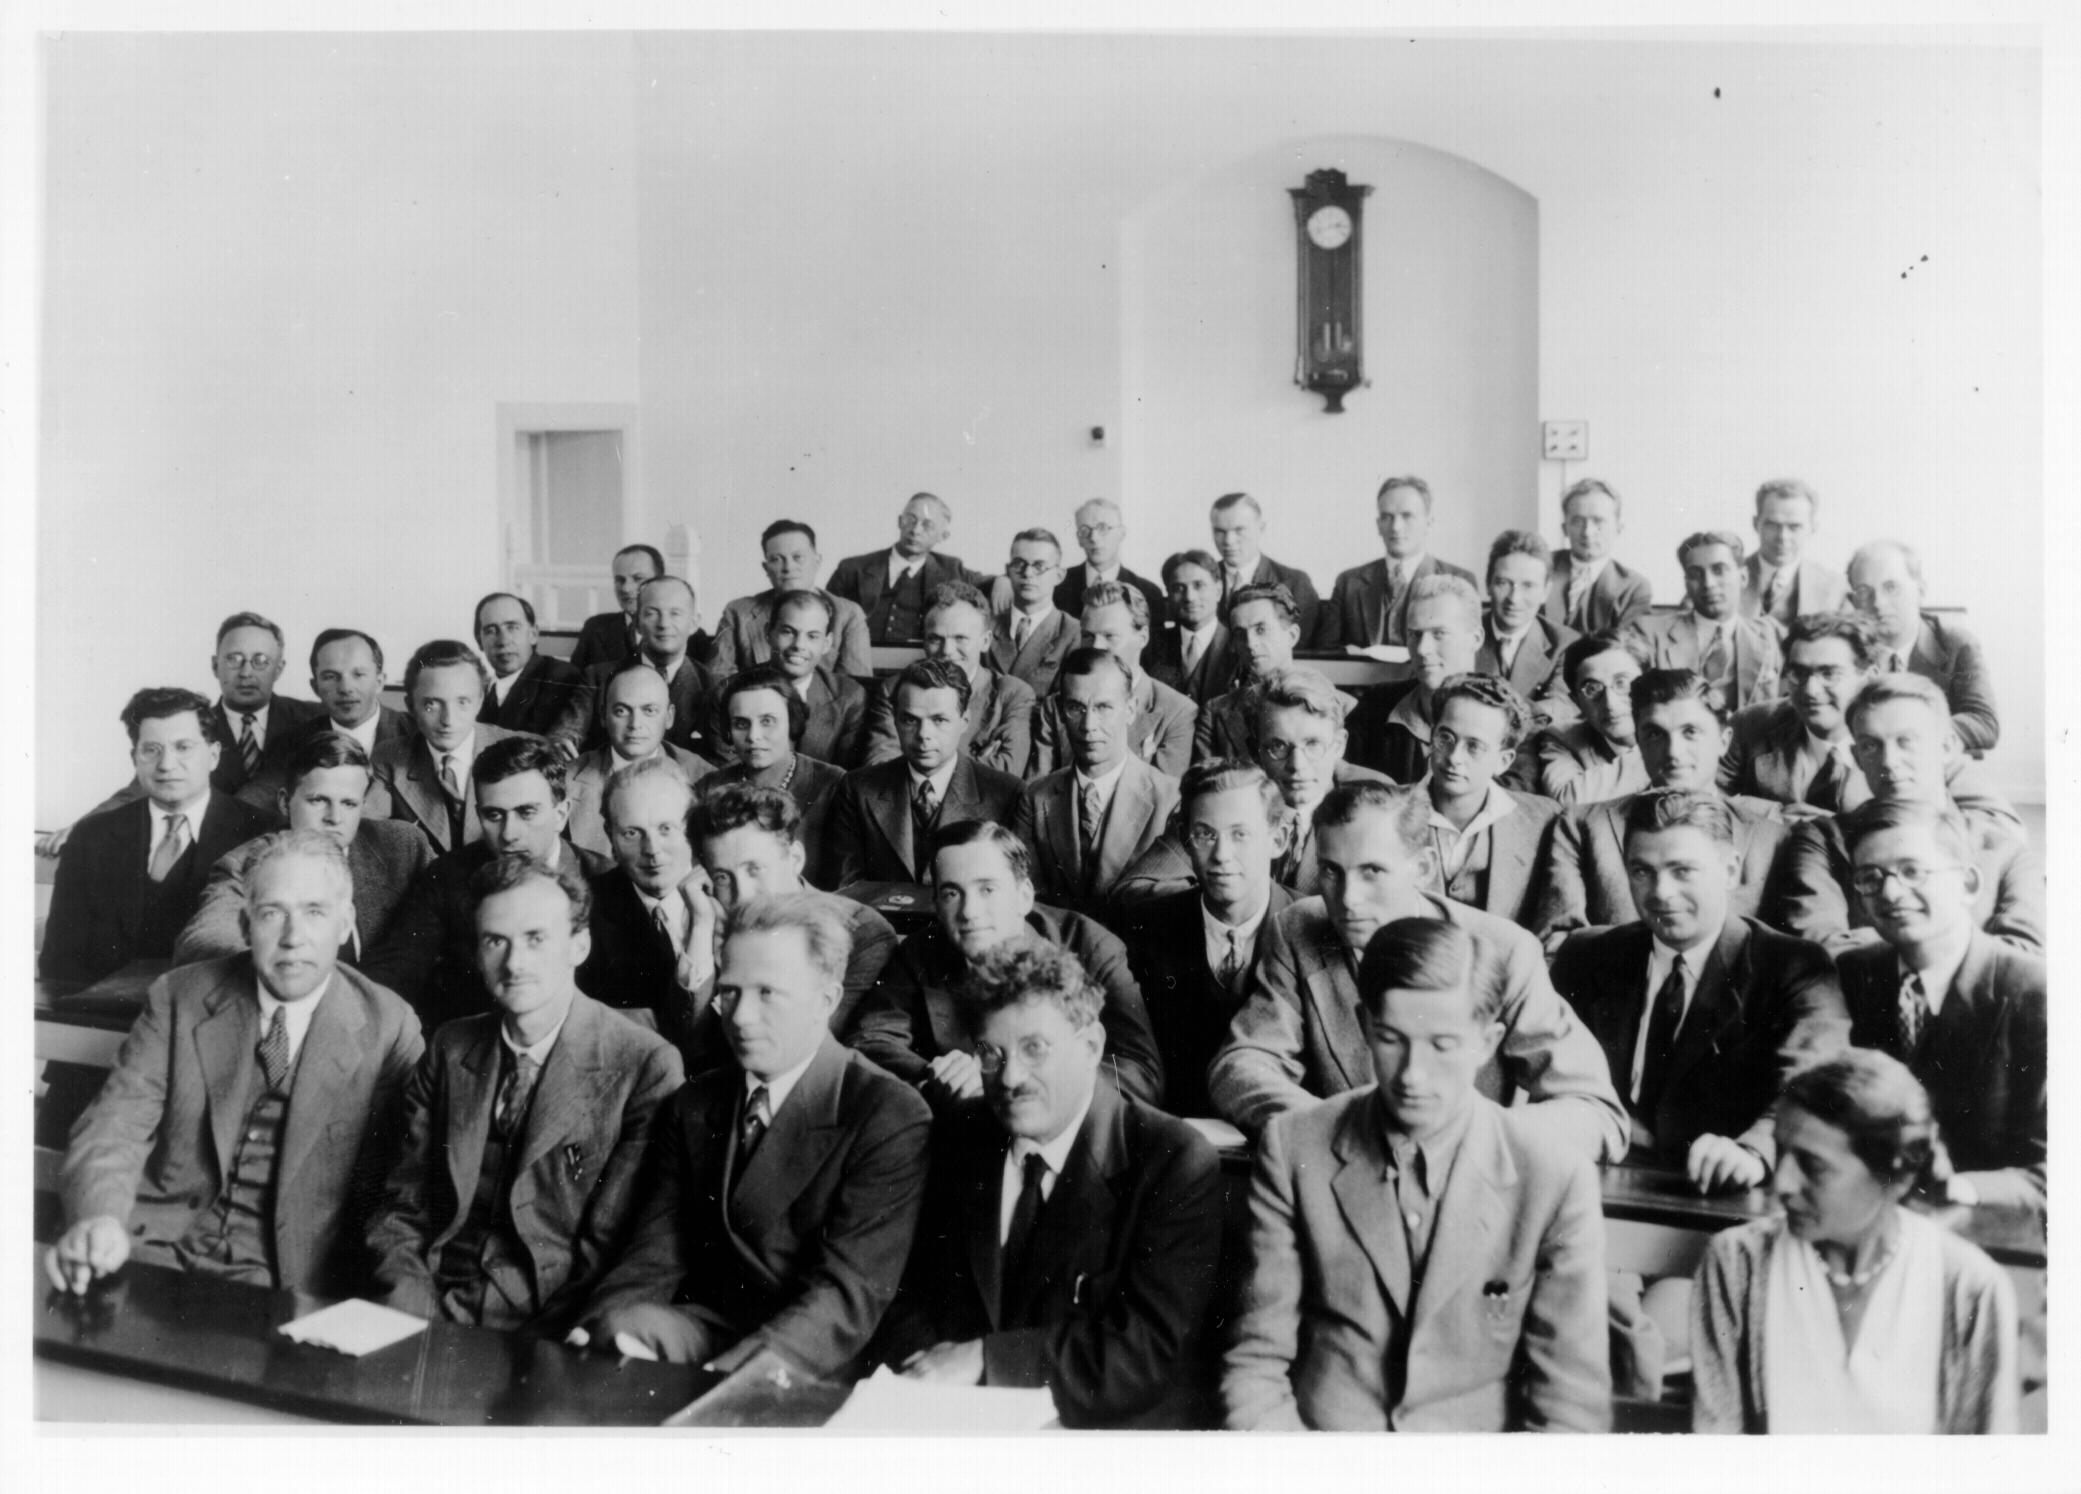 bohrinstitute1933.jpg